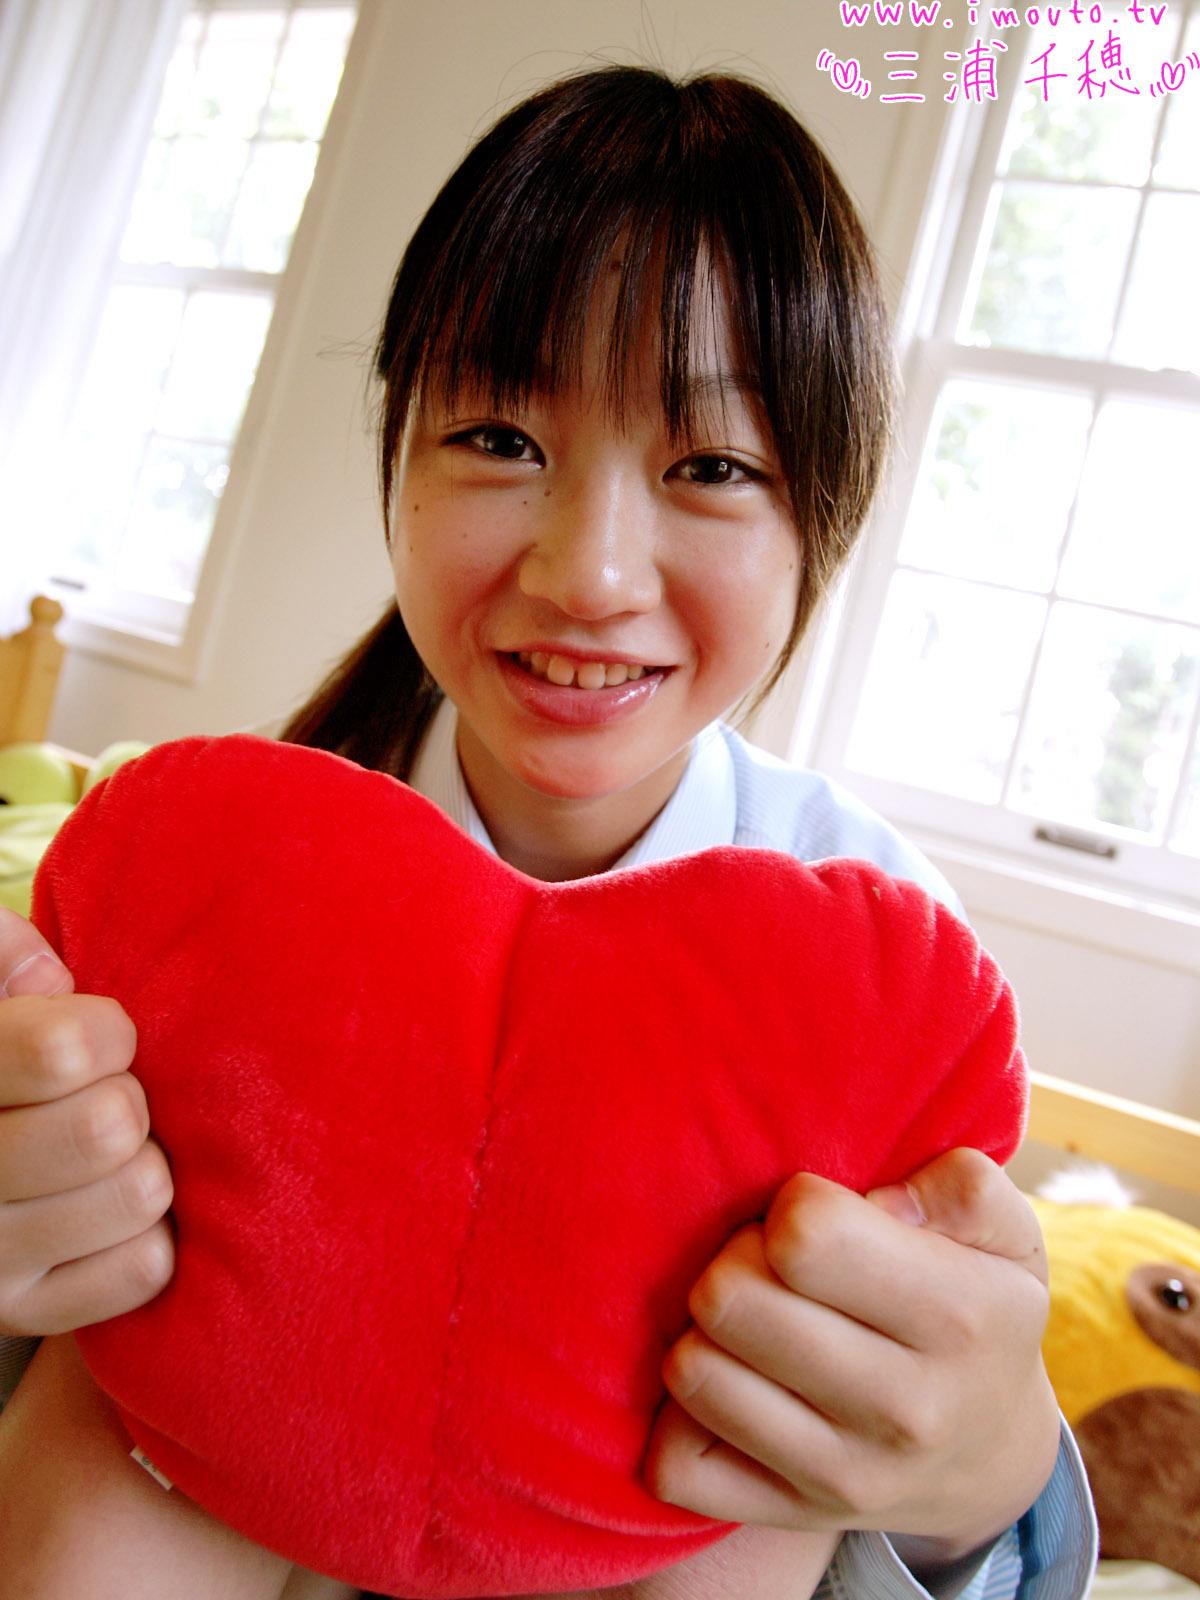 Imouto TV Junior Idol